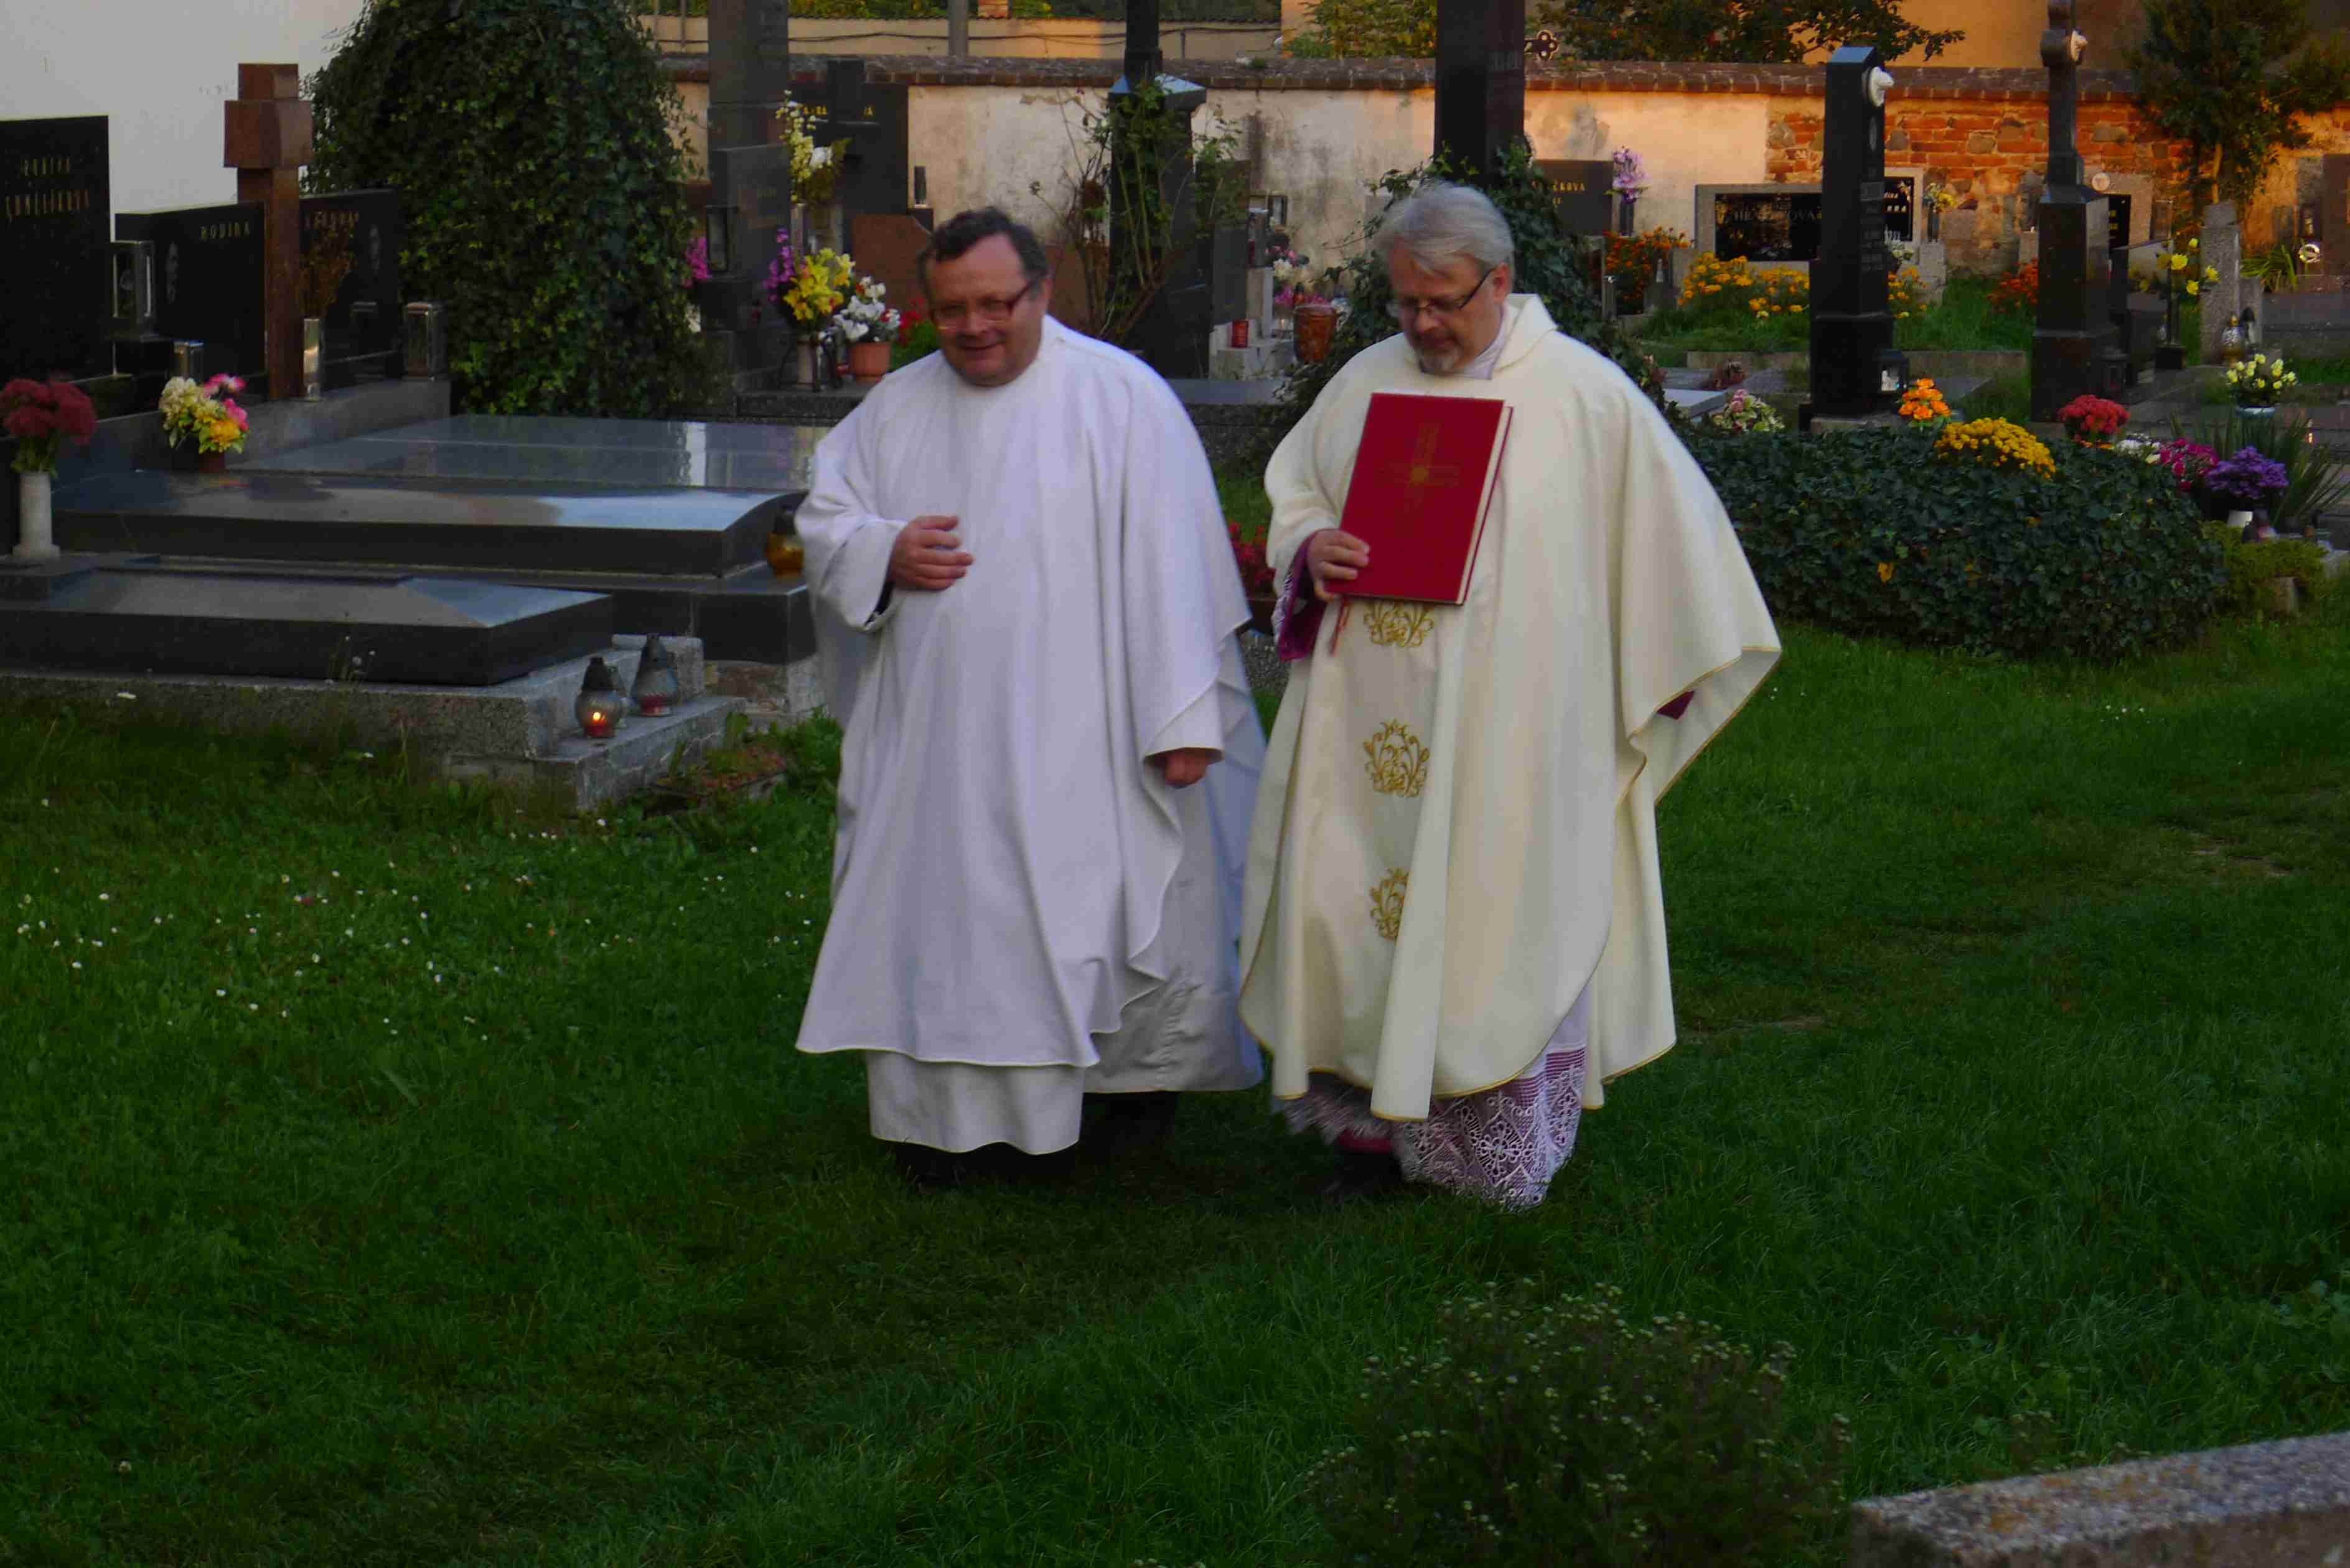 pouť ke sv. Františku 2014 - pátek - 2